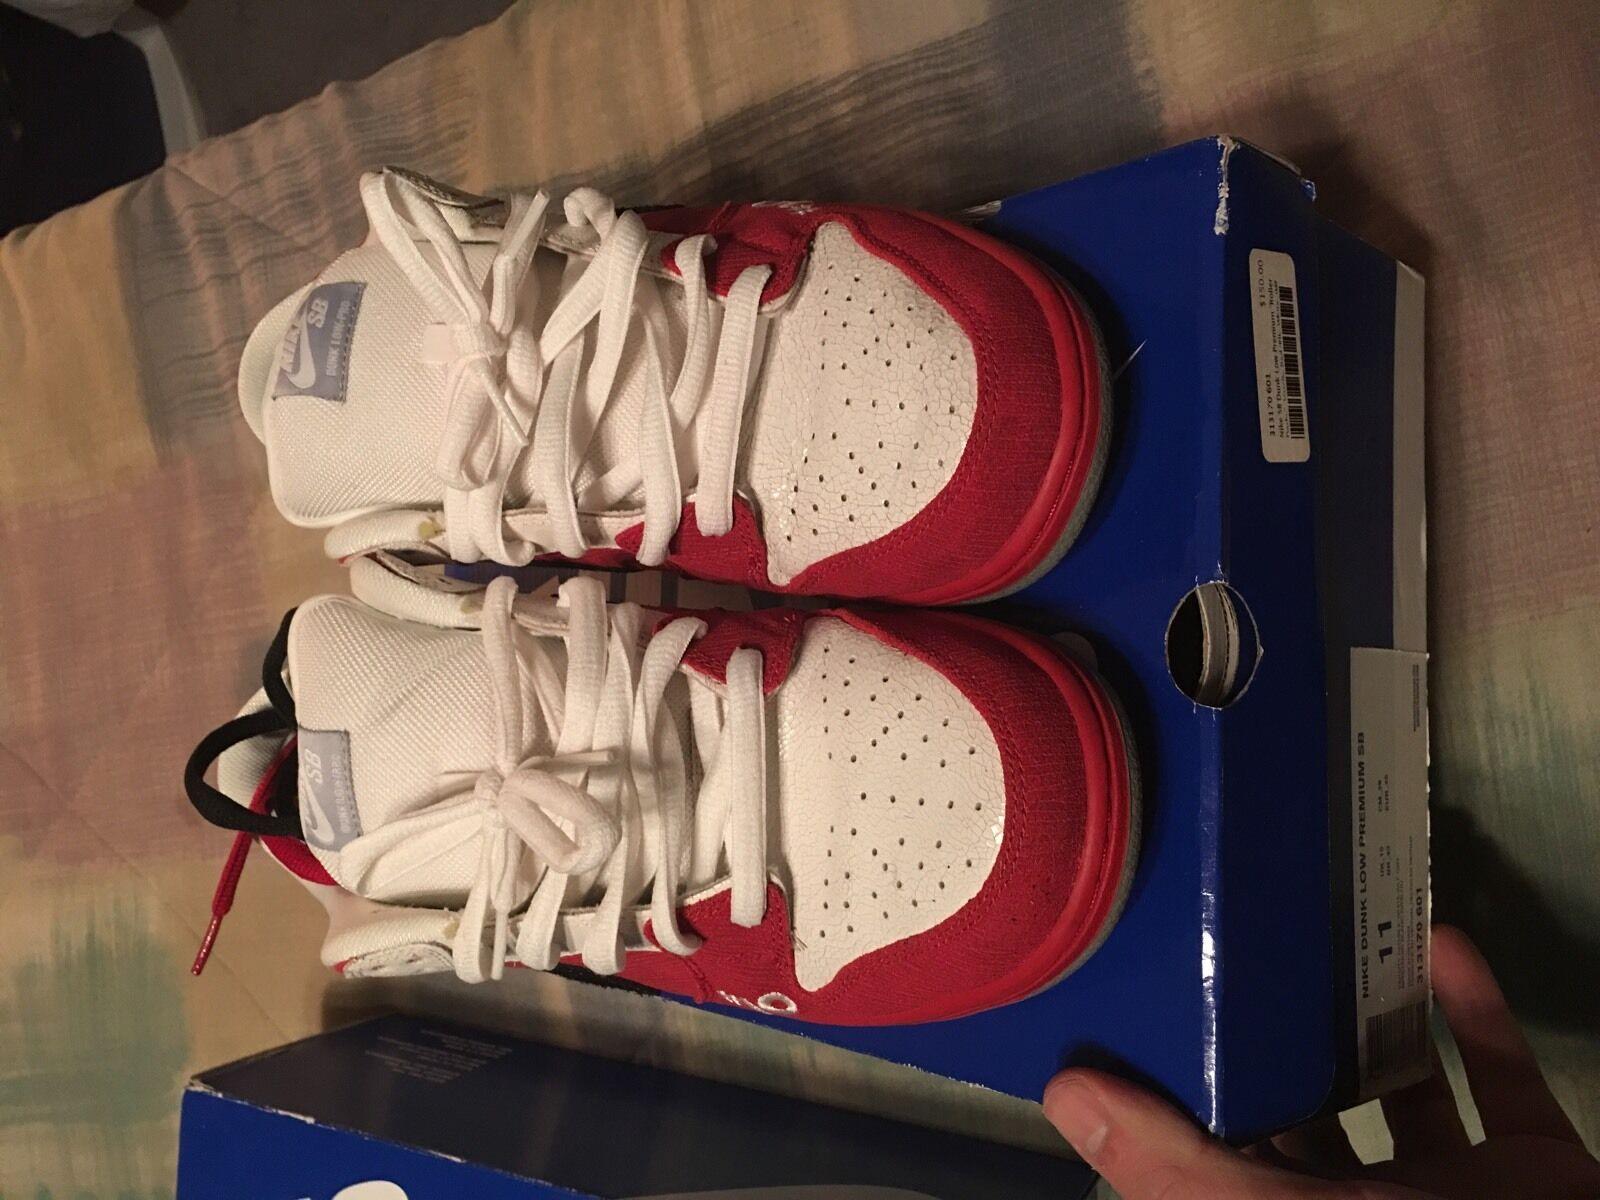 Nike Dunk Low Pro Premium Sb Roller Roller Roller Derby Size 11 Supreme Jordan Yeezy 1 2 3 4 5 24cd51